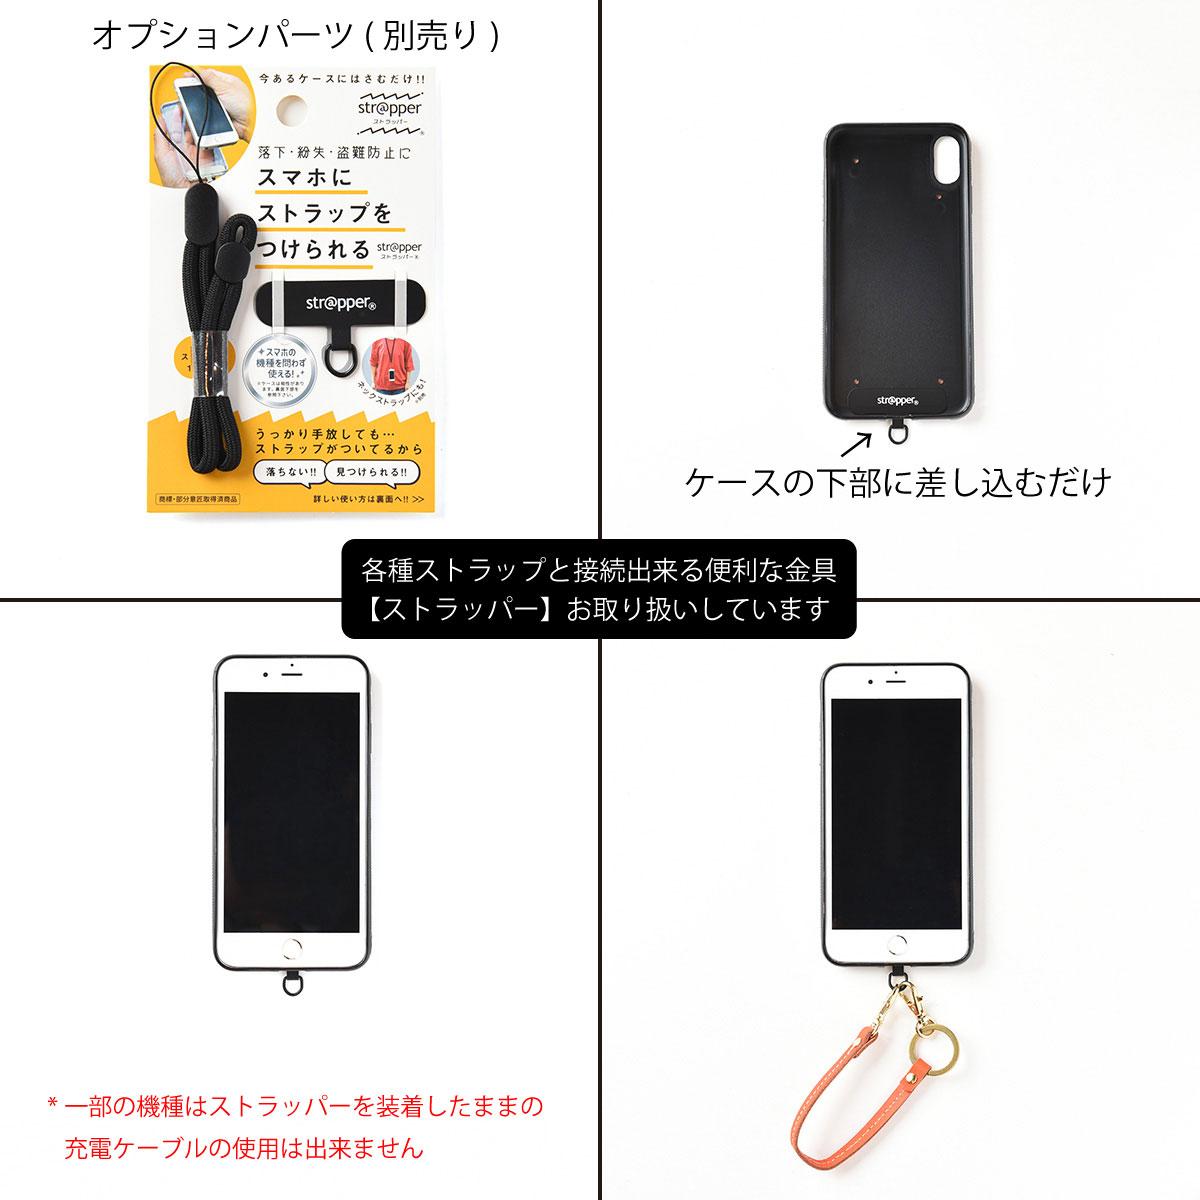 iPhoneOpenCase:   Design L:目 ファニーアイズ